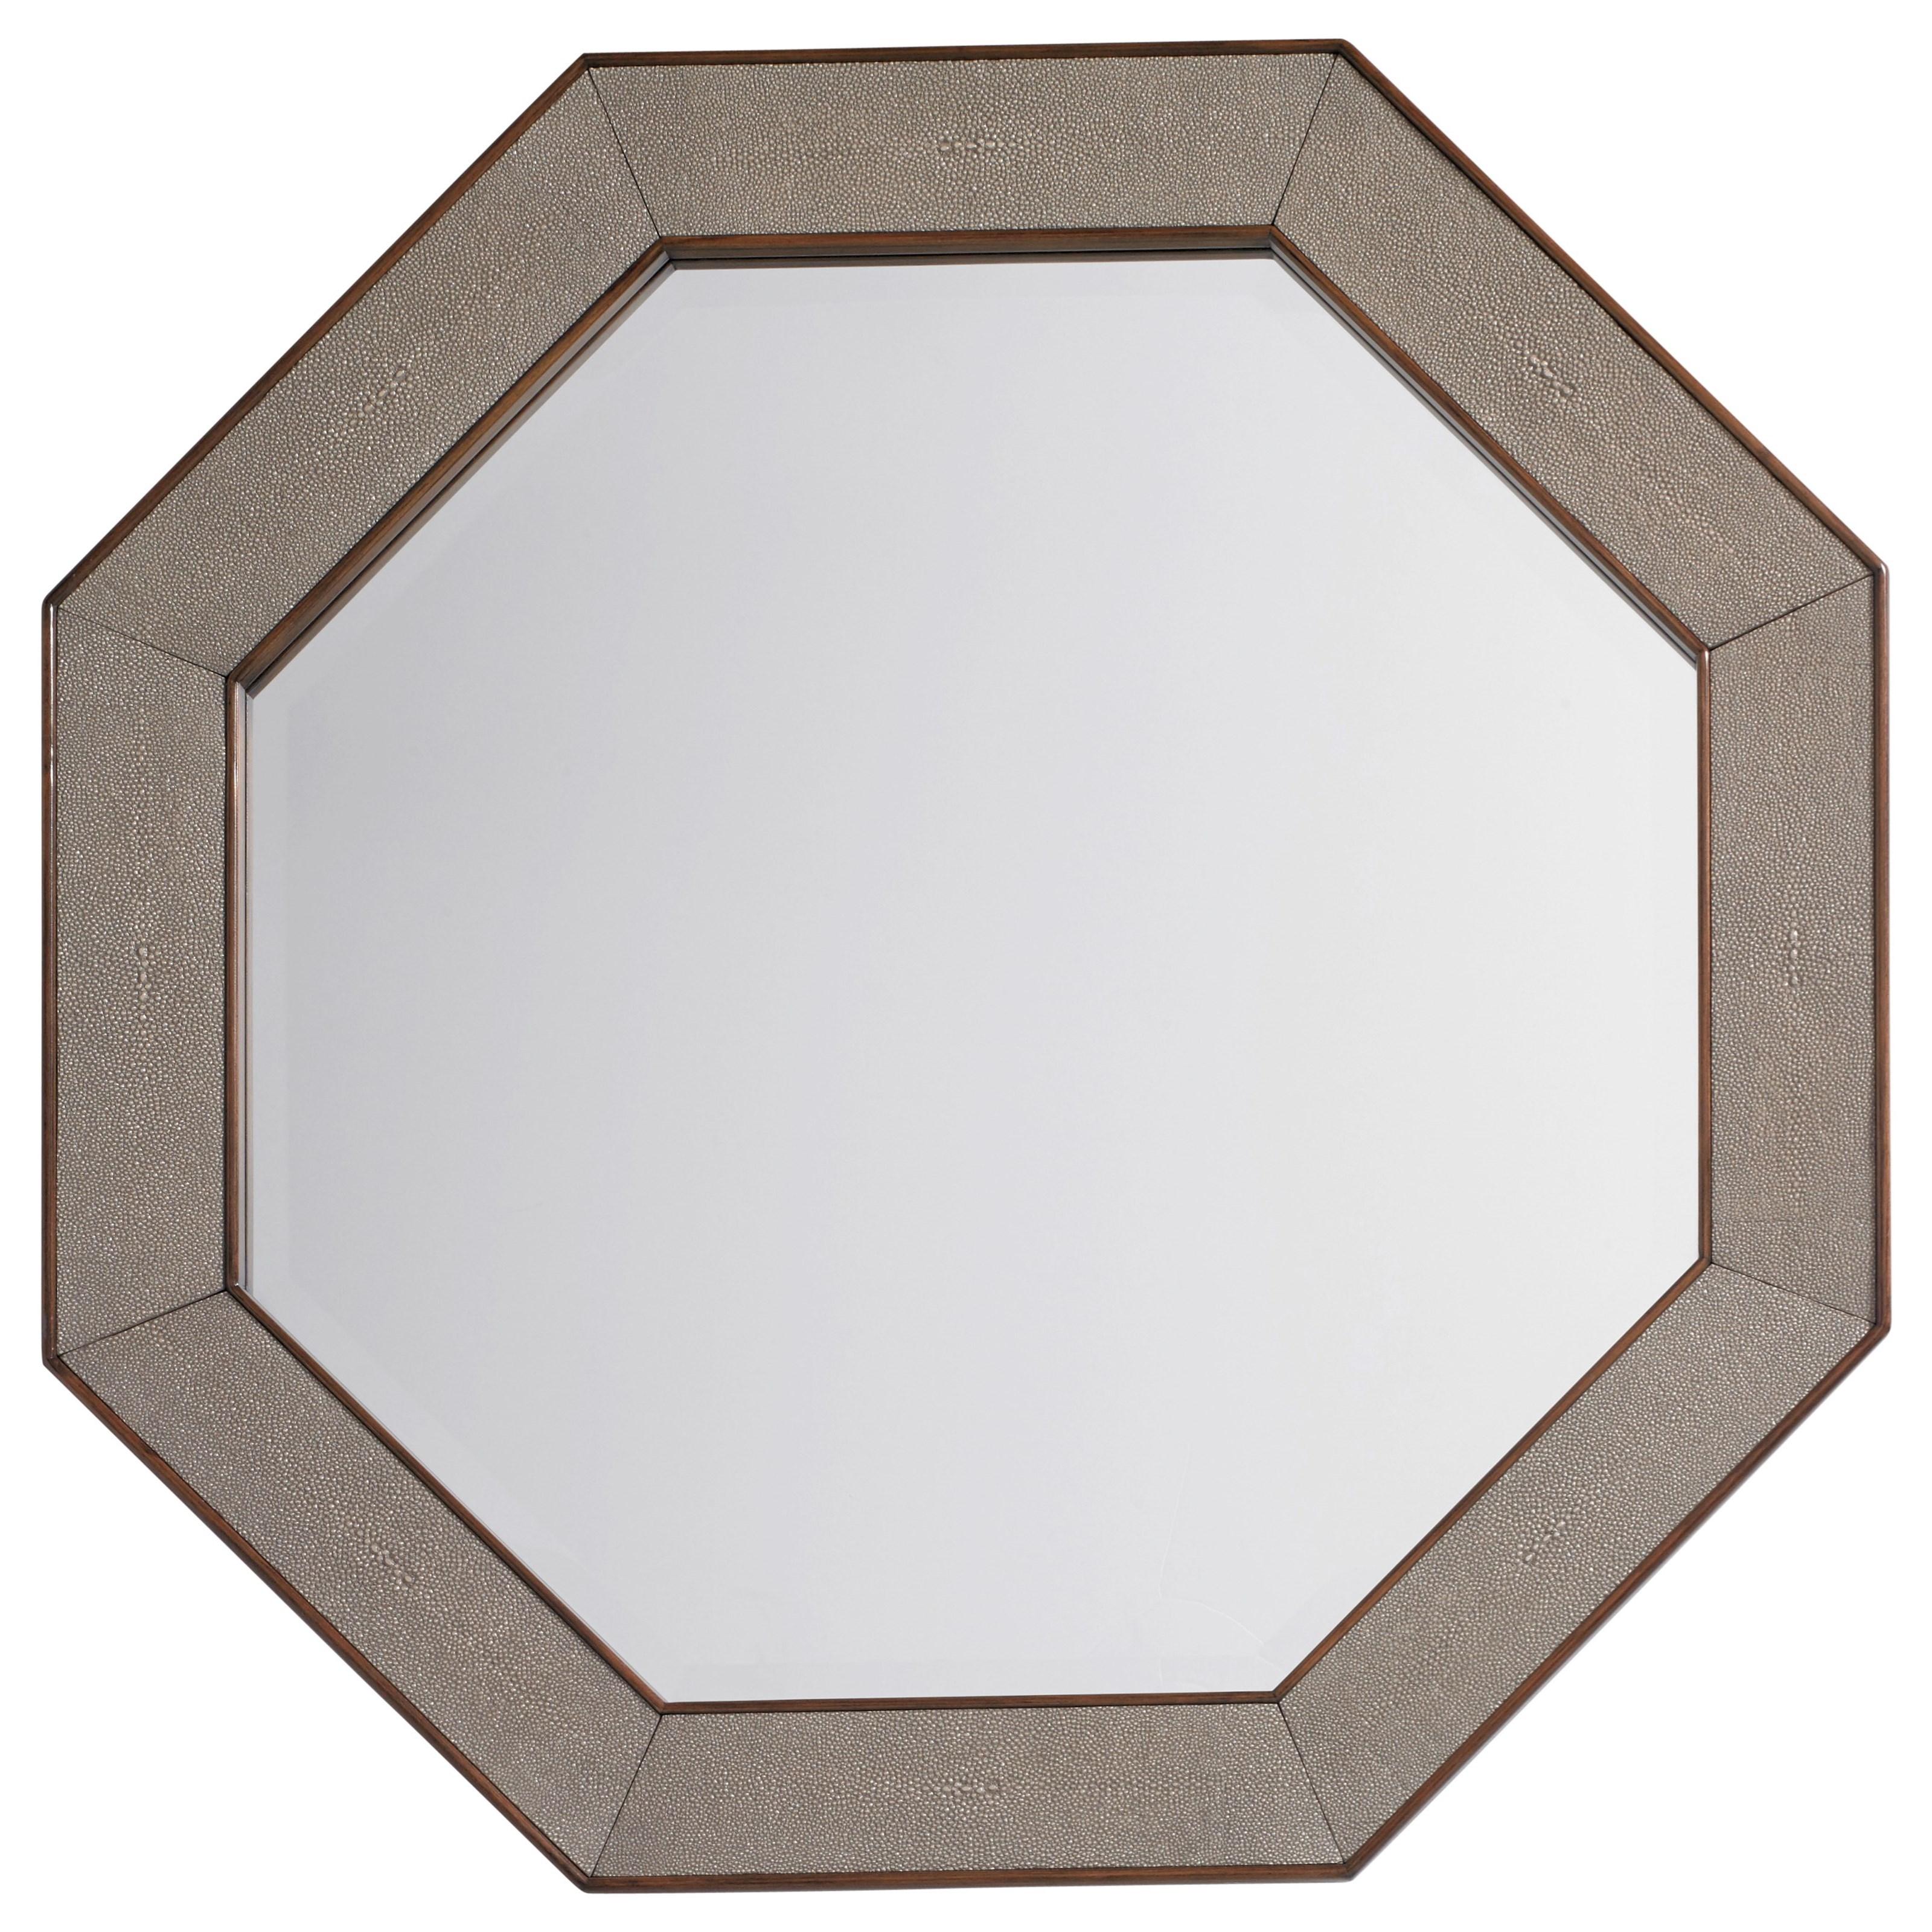 MacArthur Park Riva Octagonal Mirror by Lexington at Baer's Furniture